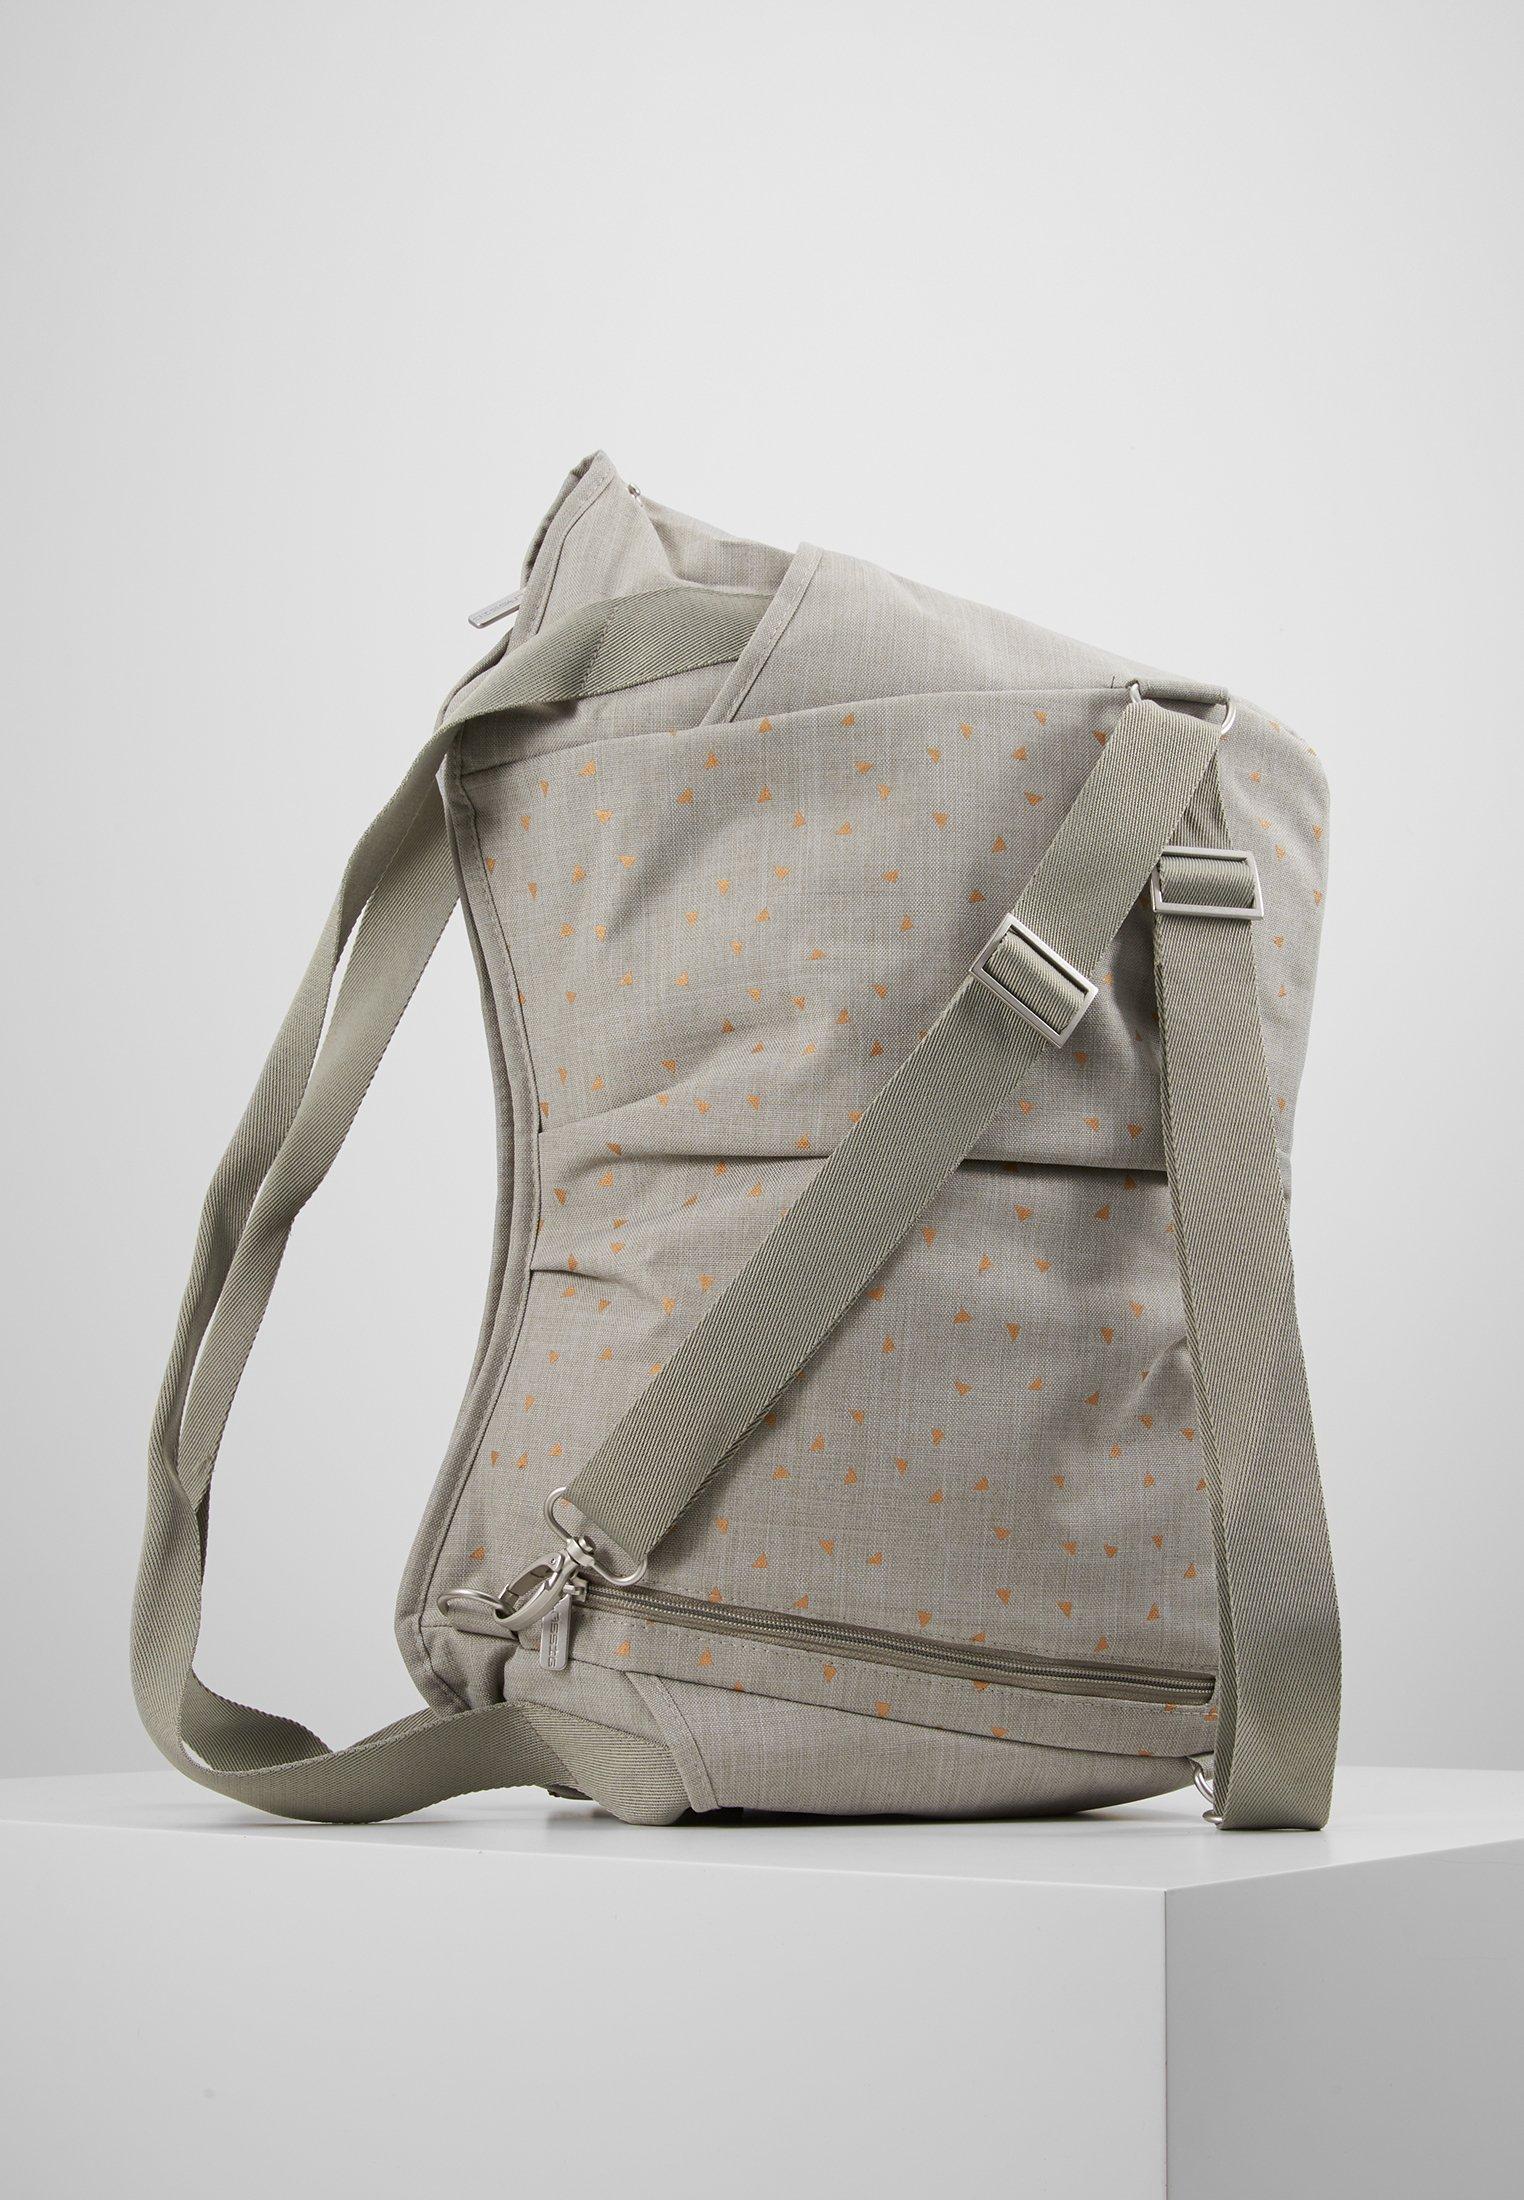 Lässig TWIN BAG TRIANGLE SET - Stelleveske - light grey/lysgrå tre1Gi91zeYu4xa